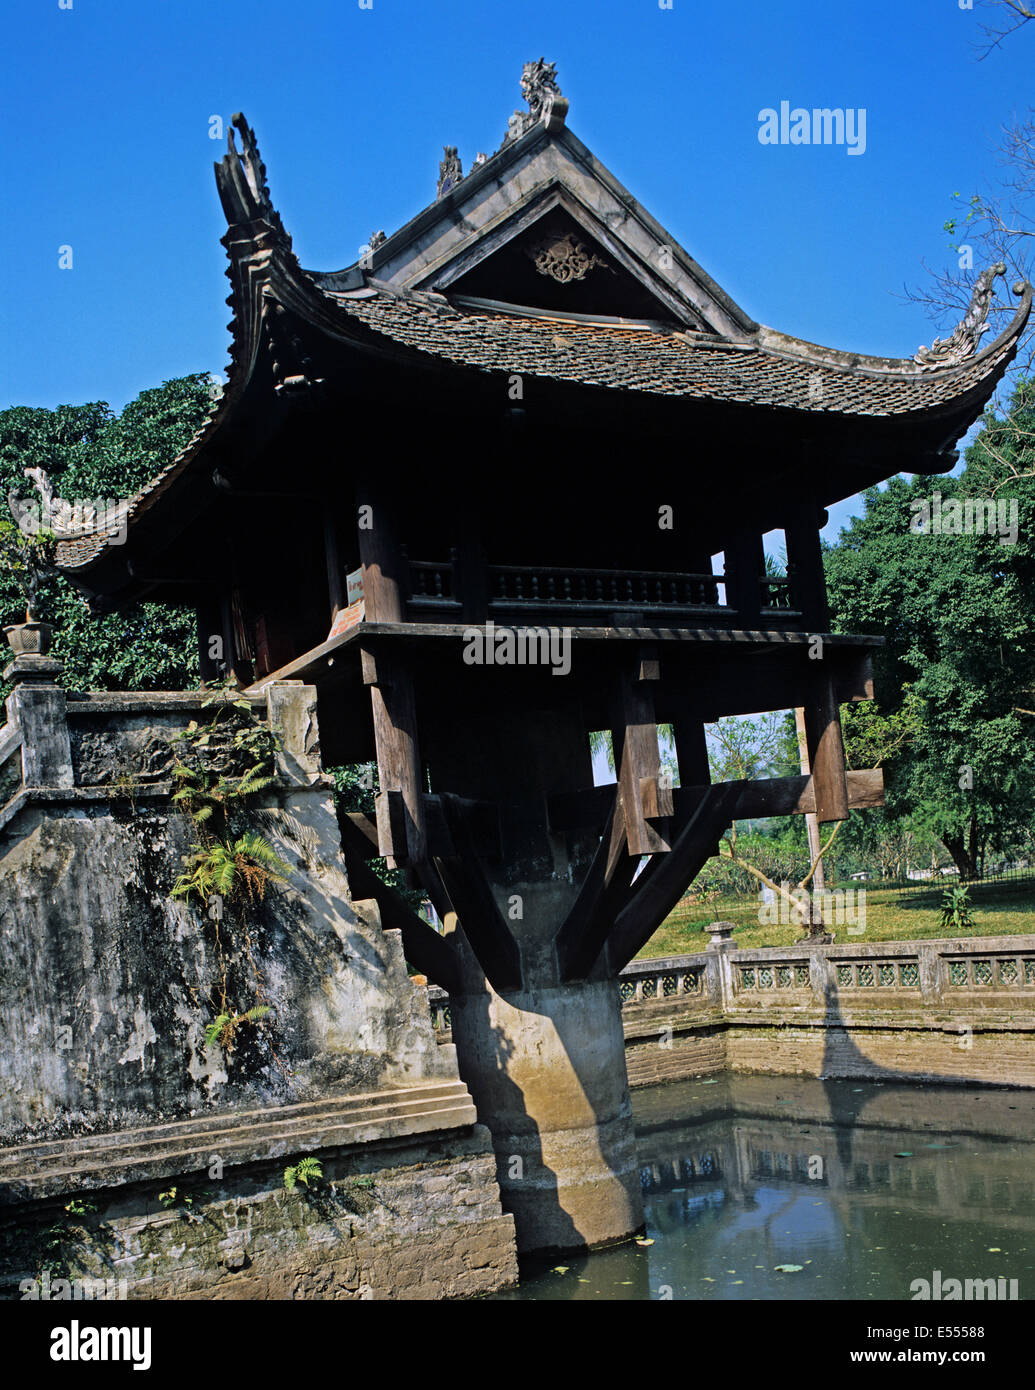 The One Pillar Pagoda, Hanoi, Vietnam Stock Photo